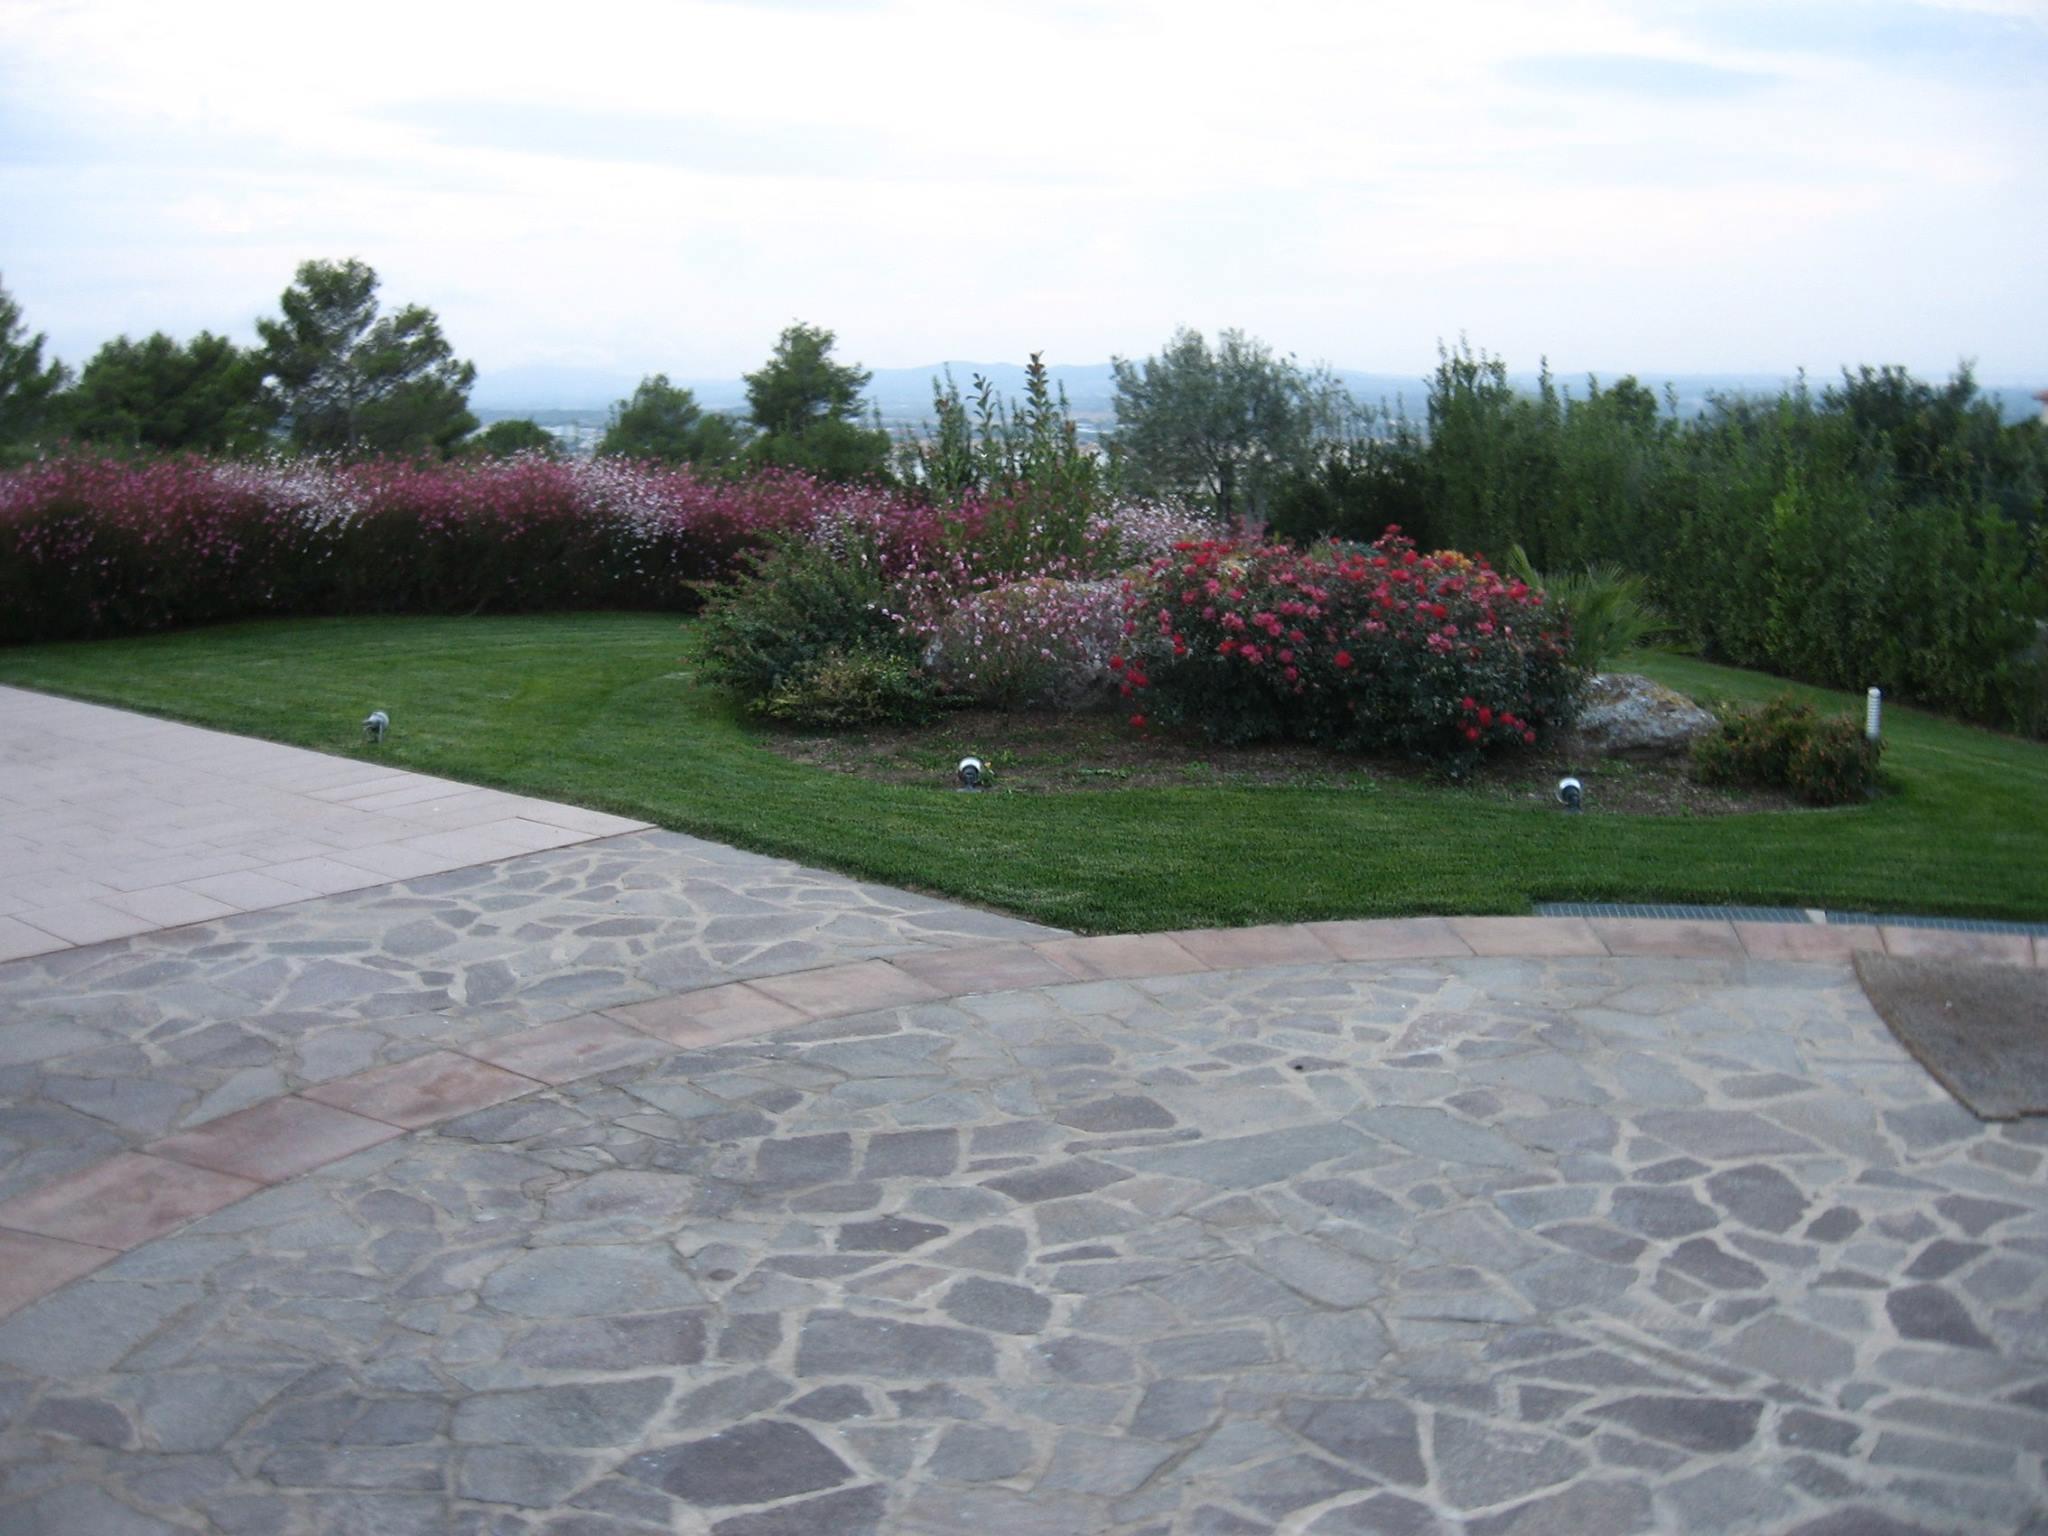 giardino finito sassari